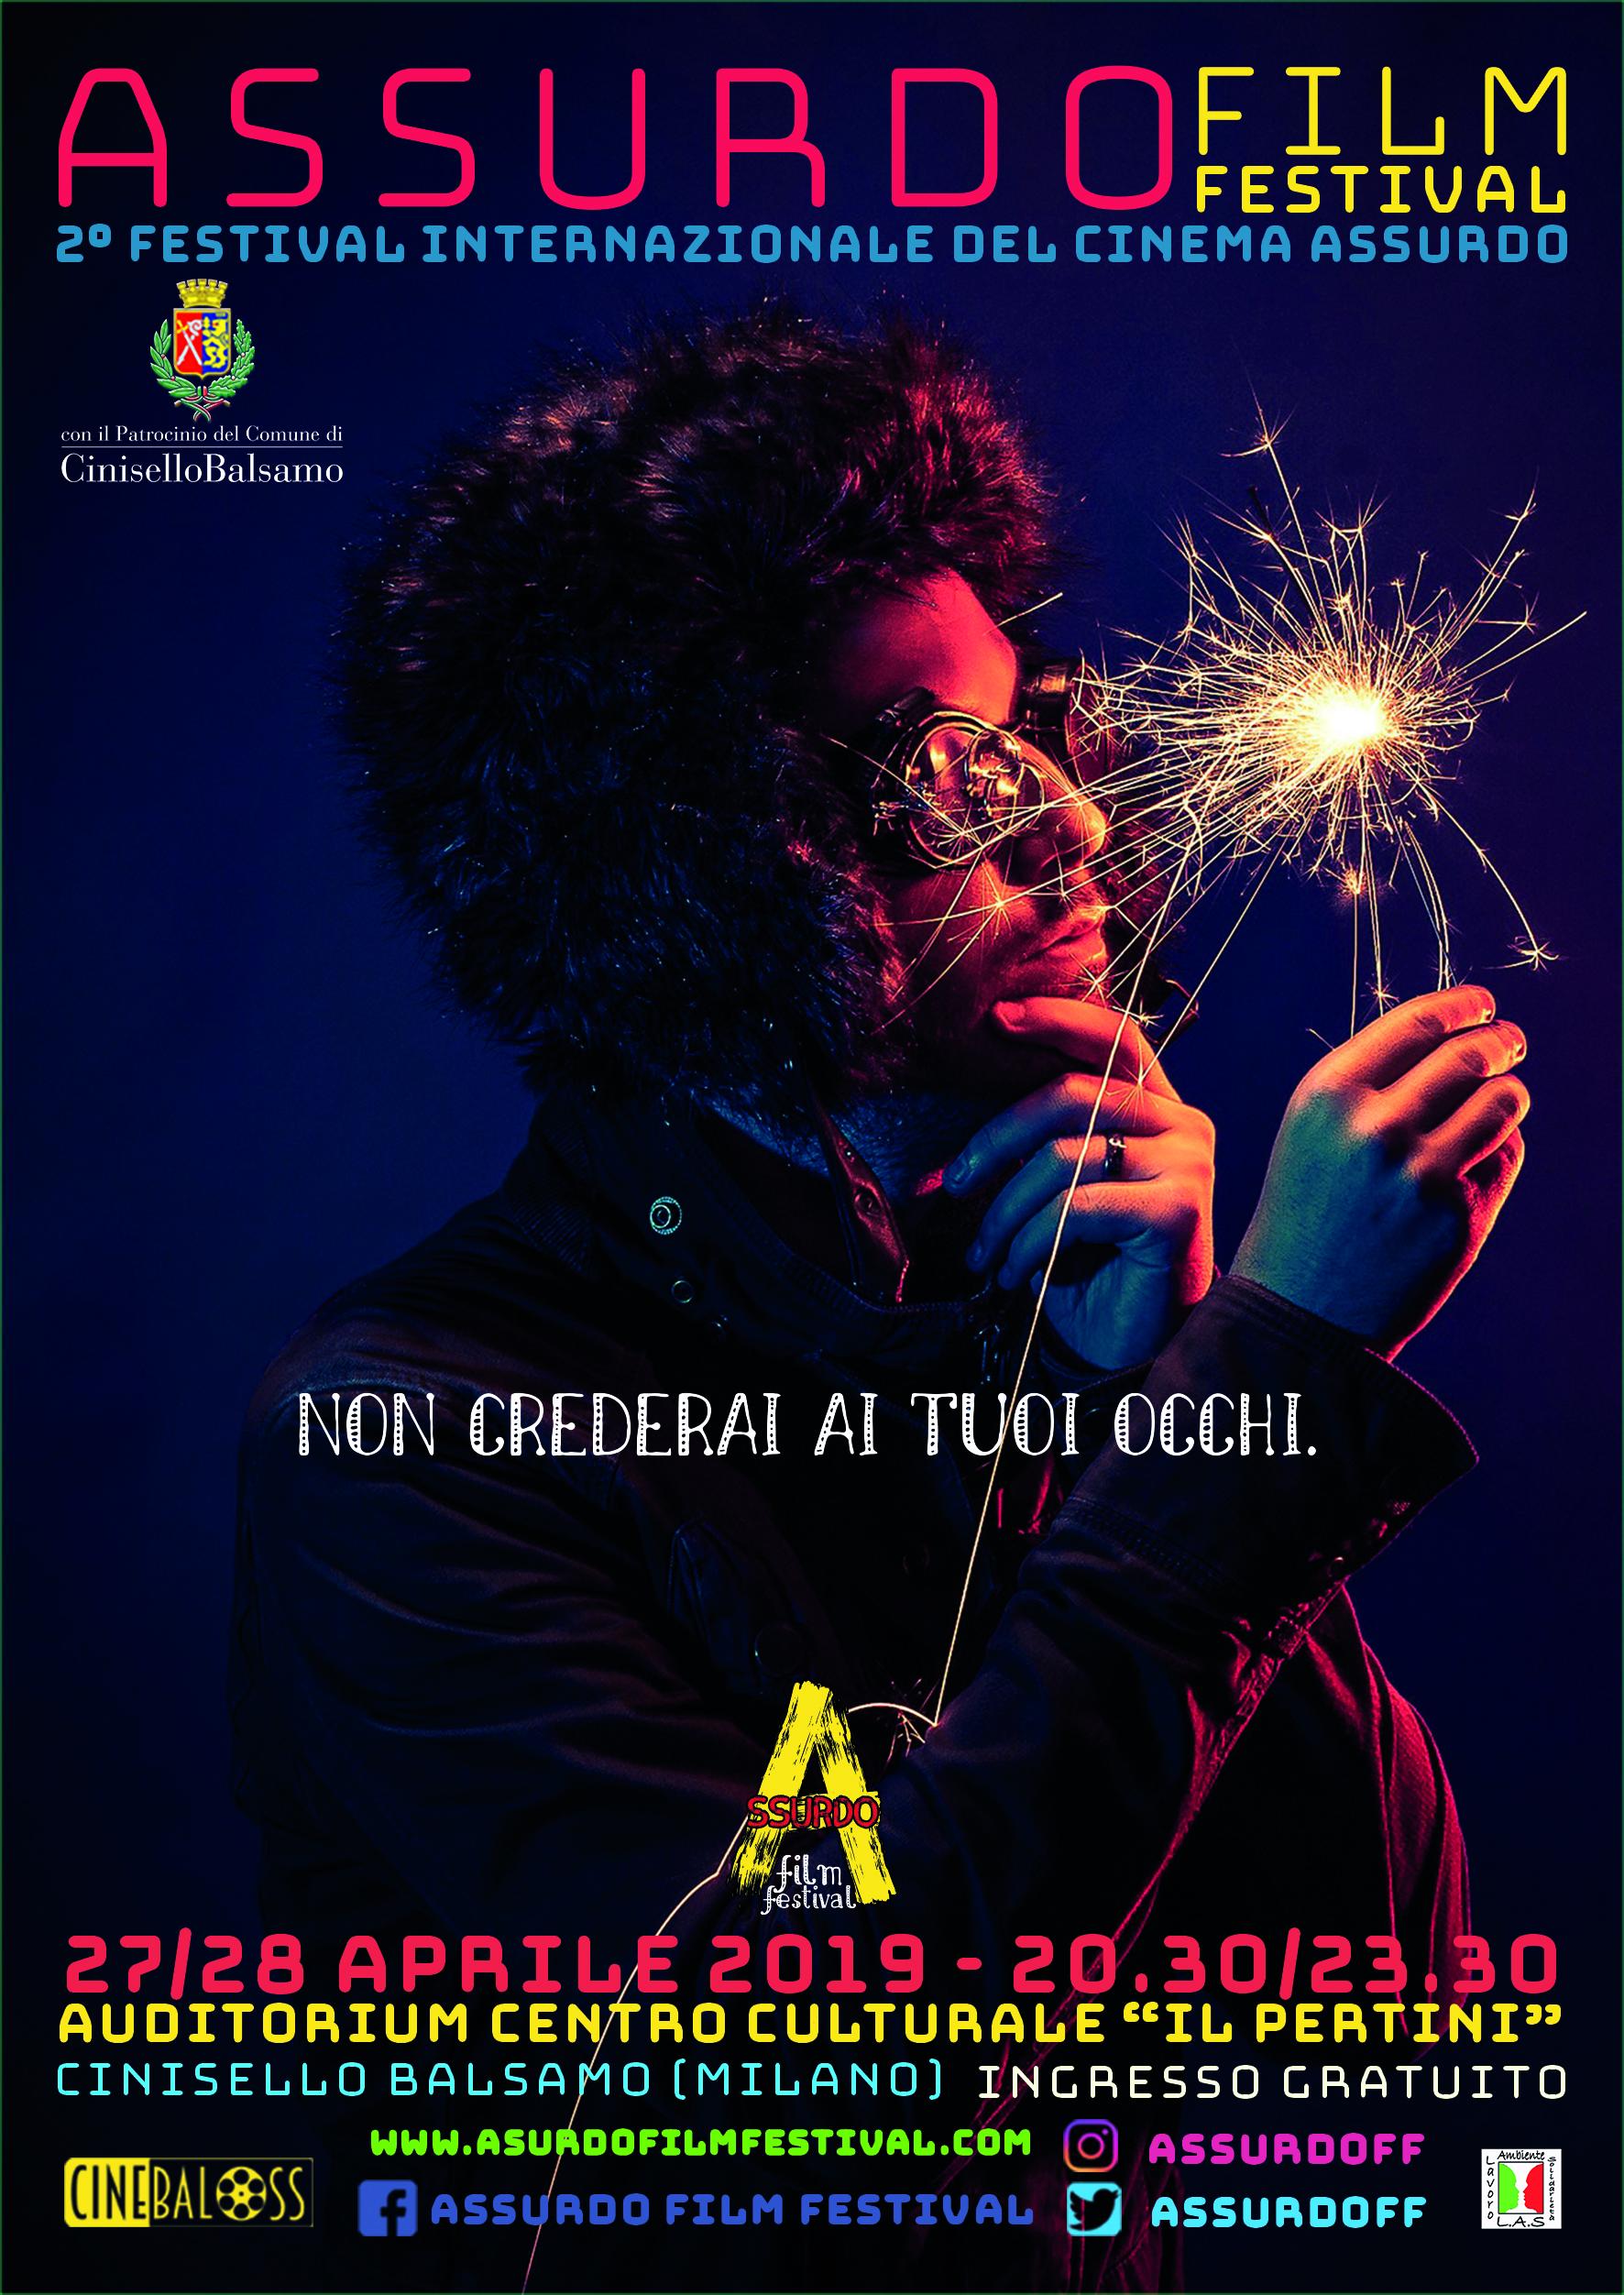 Assurdo Film Festival – i Finalisti – Assurdo film Festival – The finalists